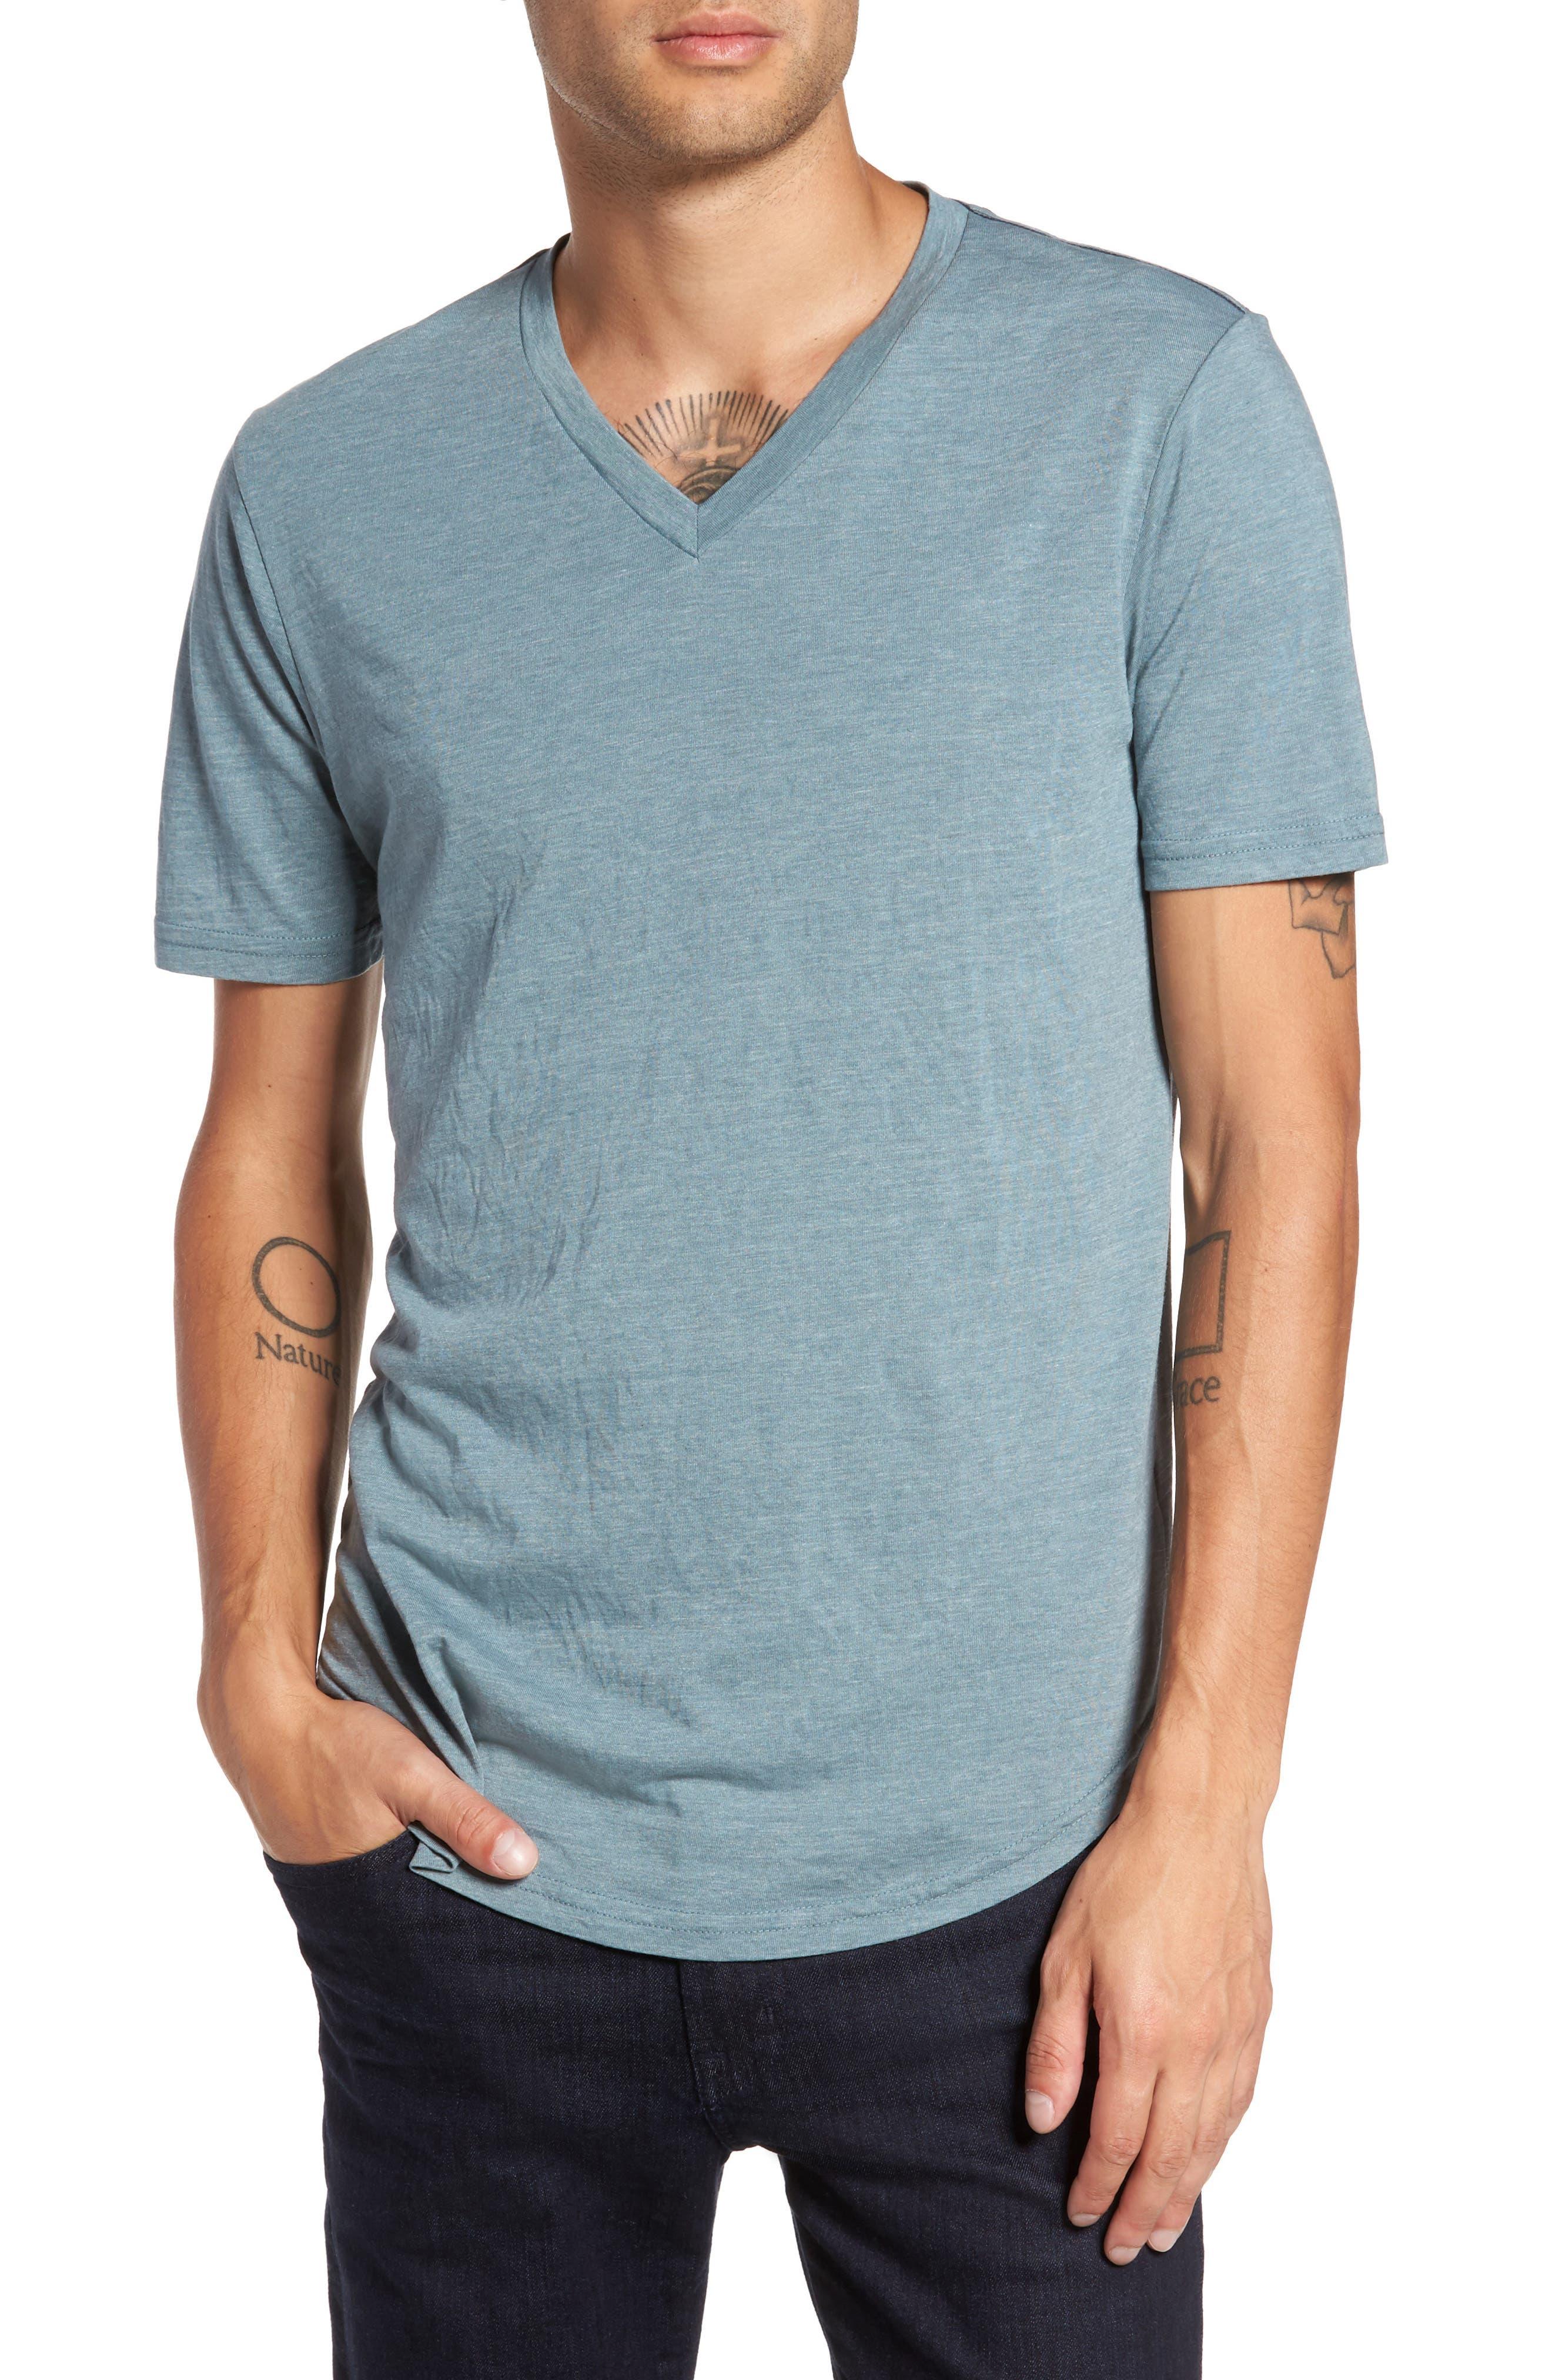 Main Image - Goodlife V-Neck T-Shirt